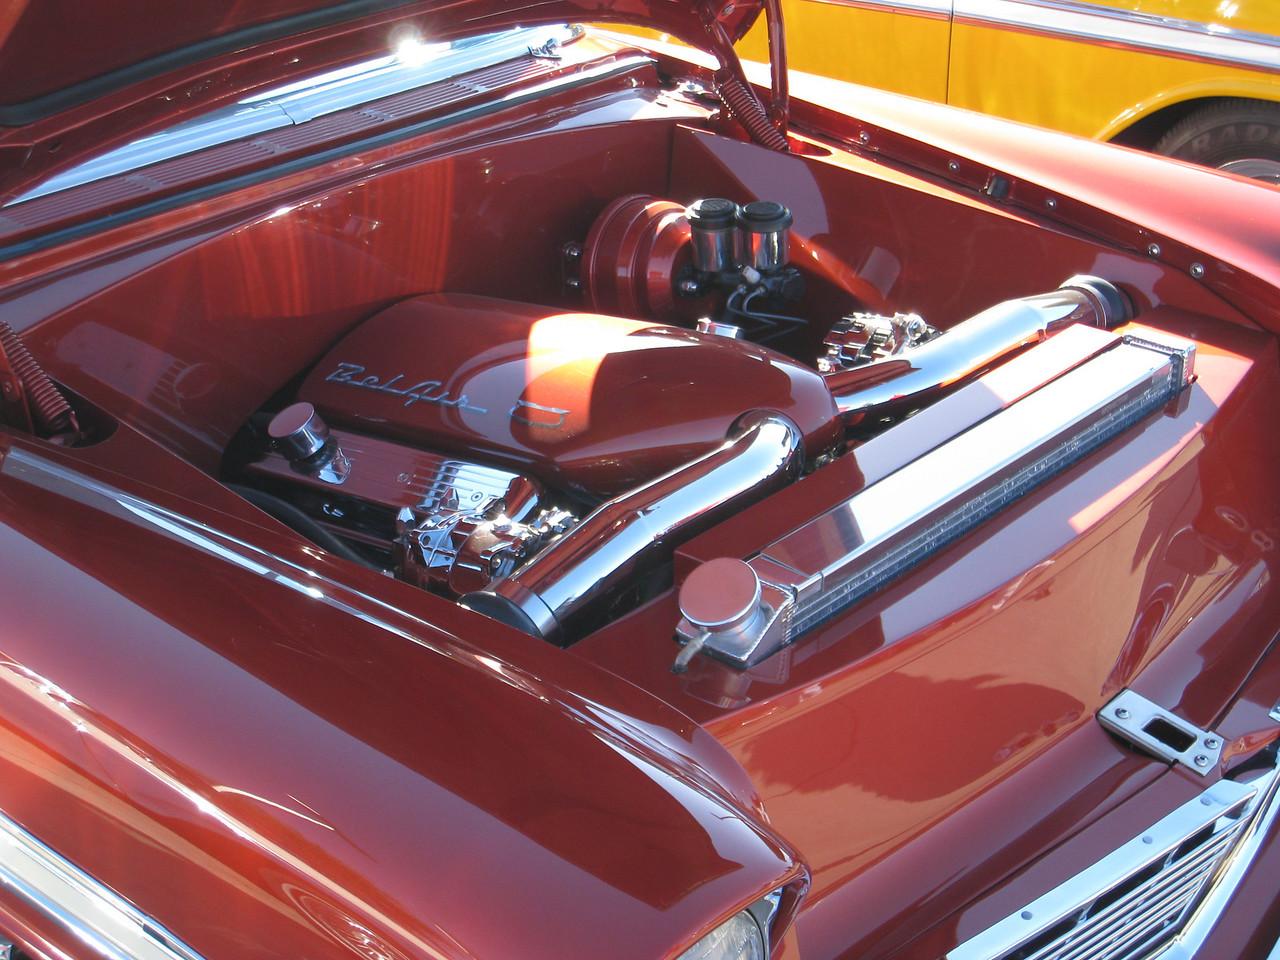 Chevy Bel Air engine - clean!